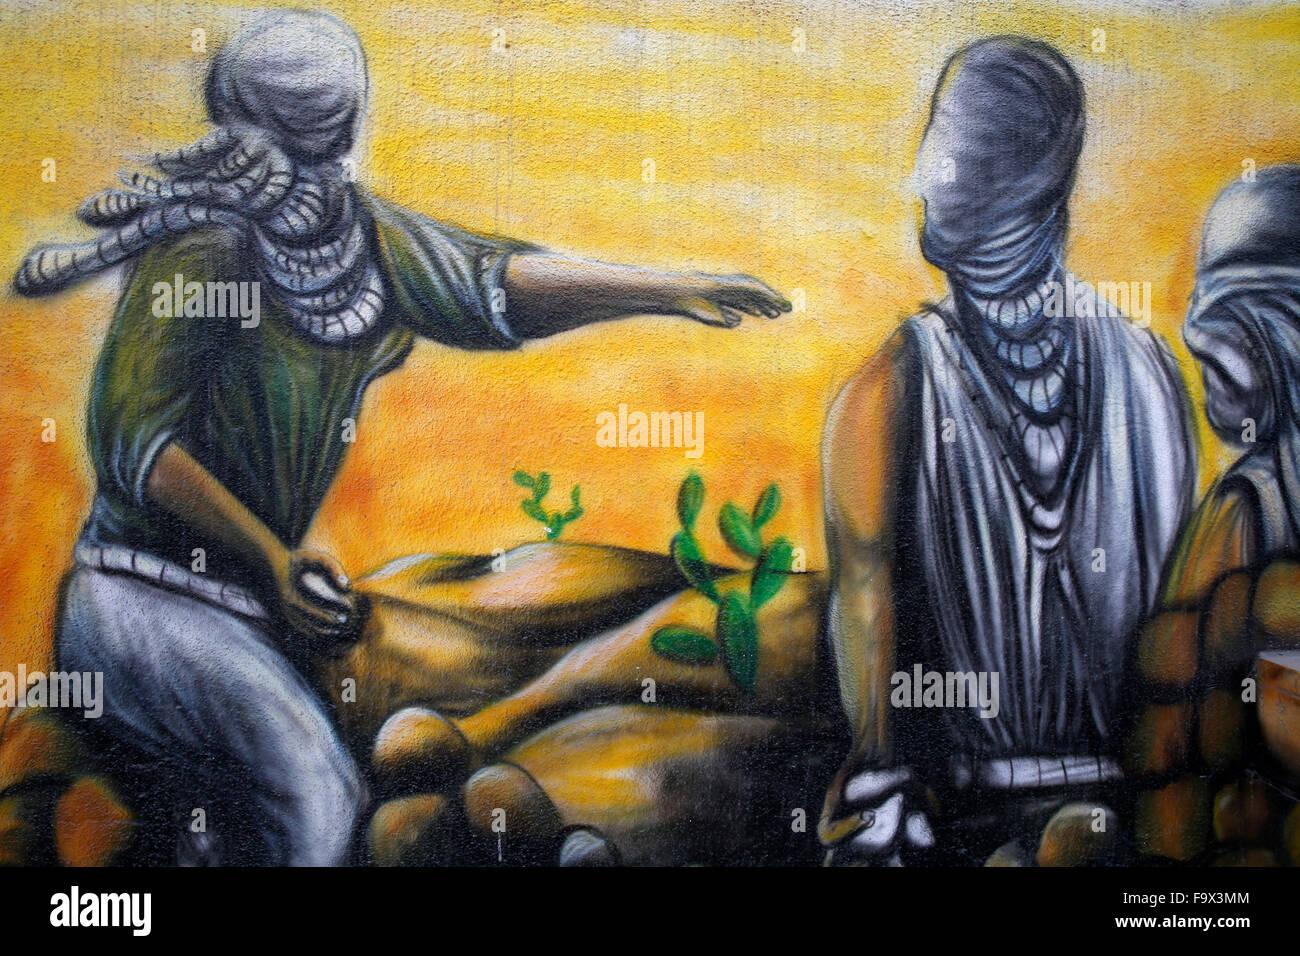 Magnificent Palestinian Wall Art Illustration - Art & Wall Decor ...